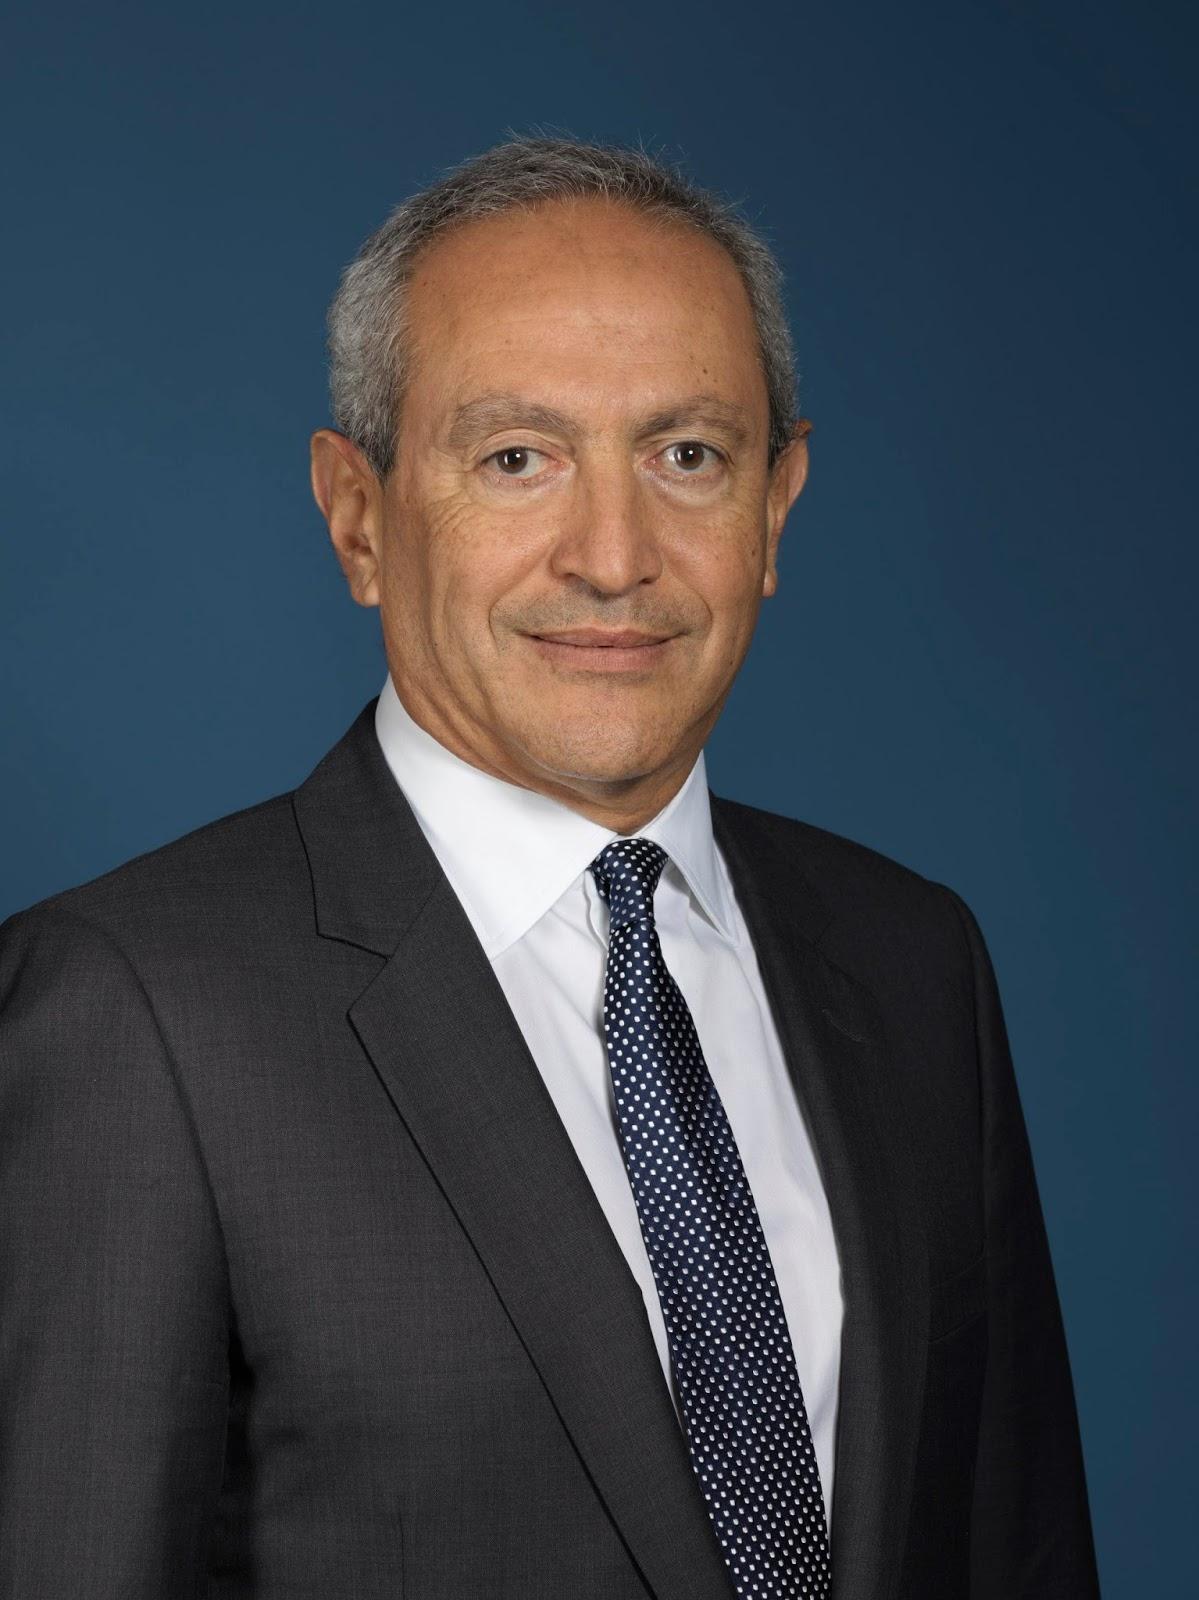 Nassef Sawiris Biography - Age, Net Worth   MyBioHub